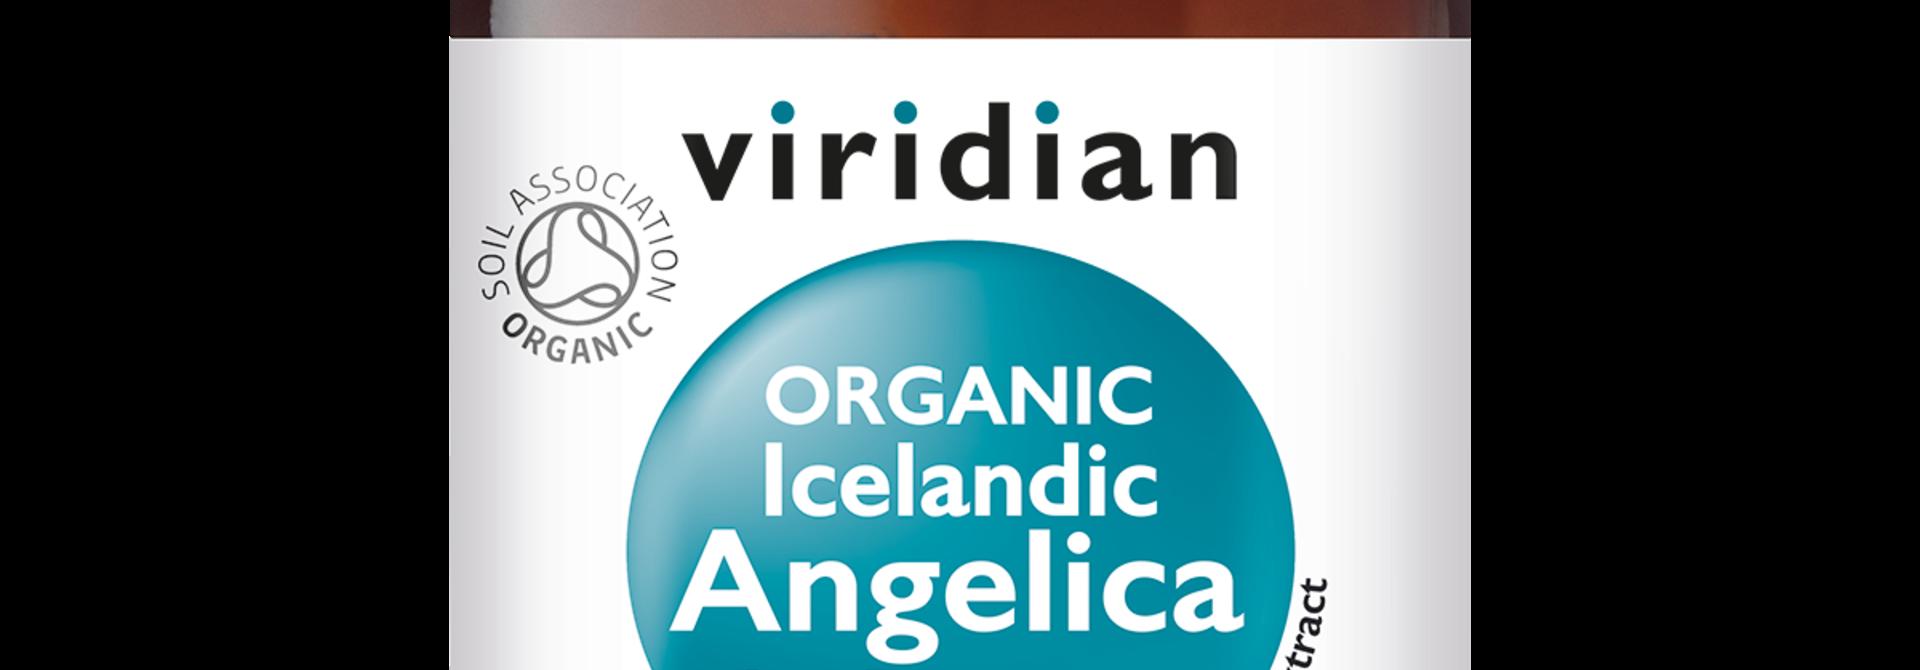 Organic Icelandic Angelica Leaf Extract 30 plantaardige capsules